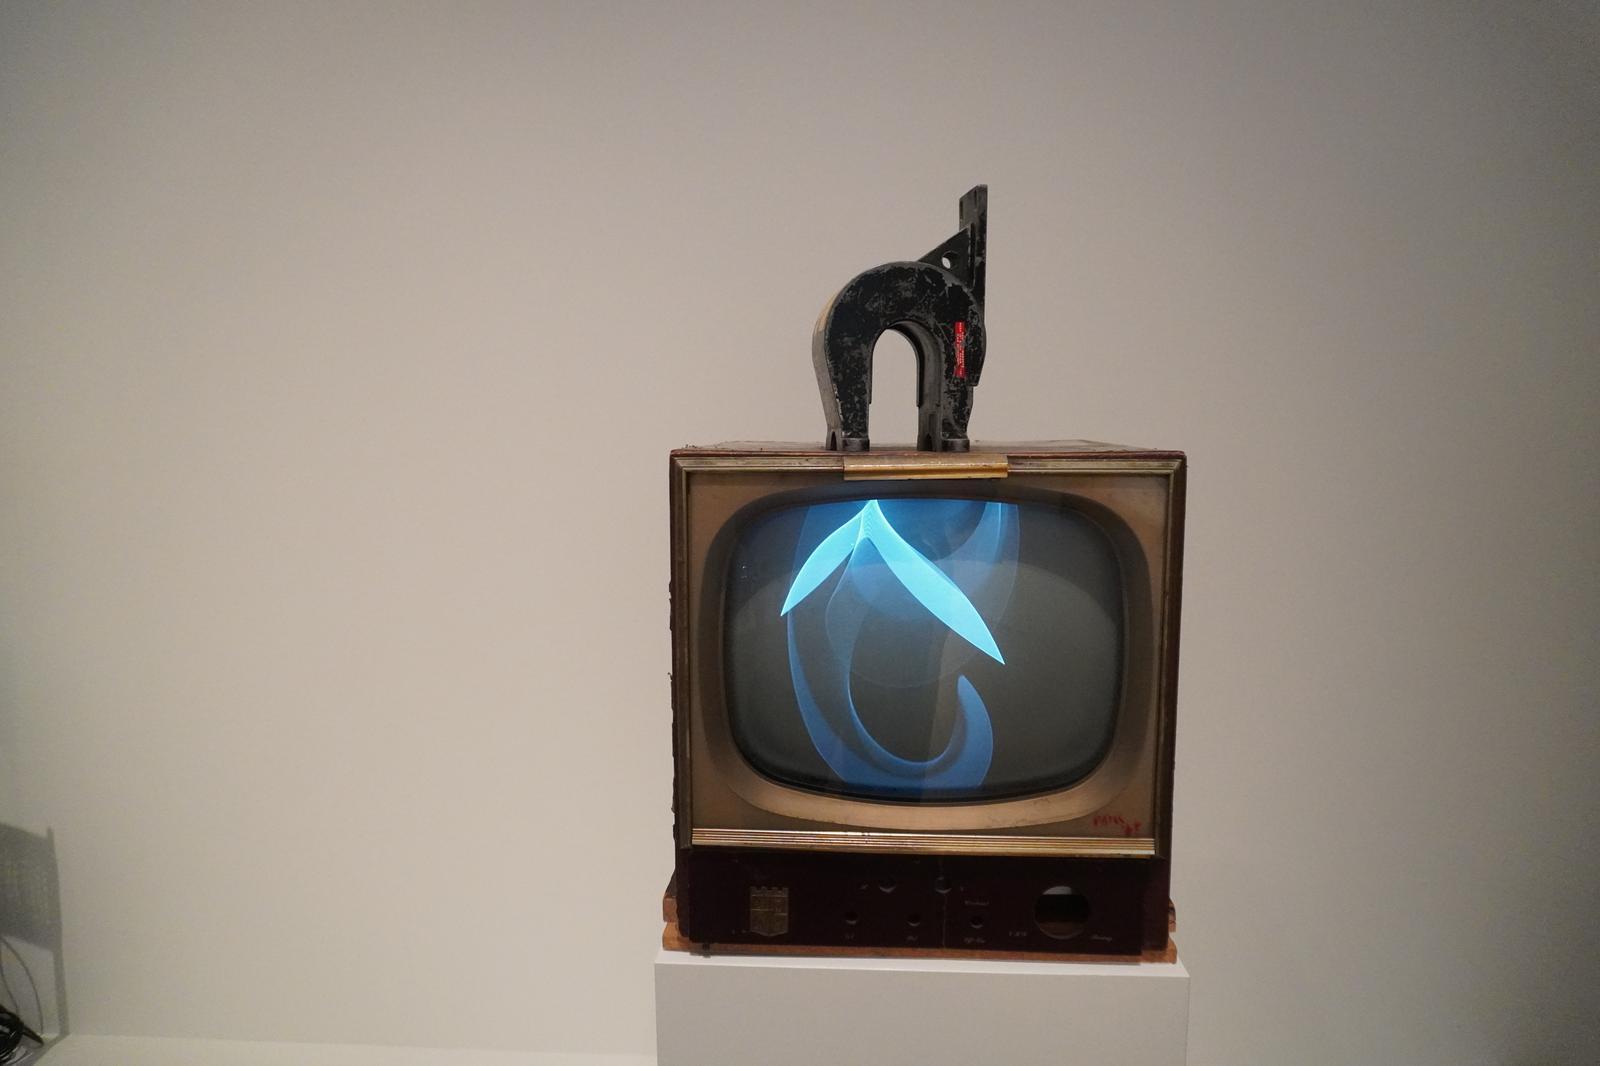 Magnet TV (1965)